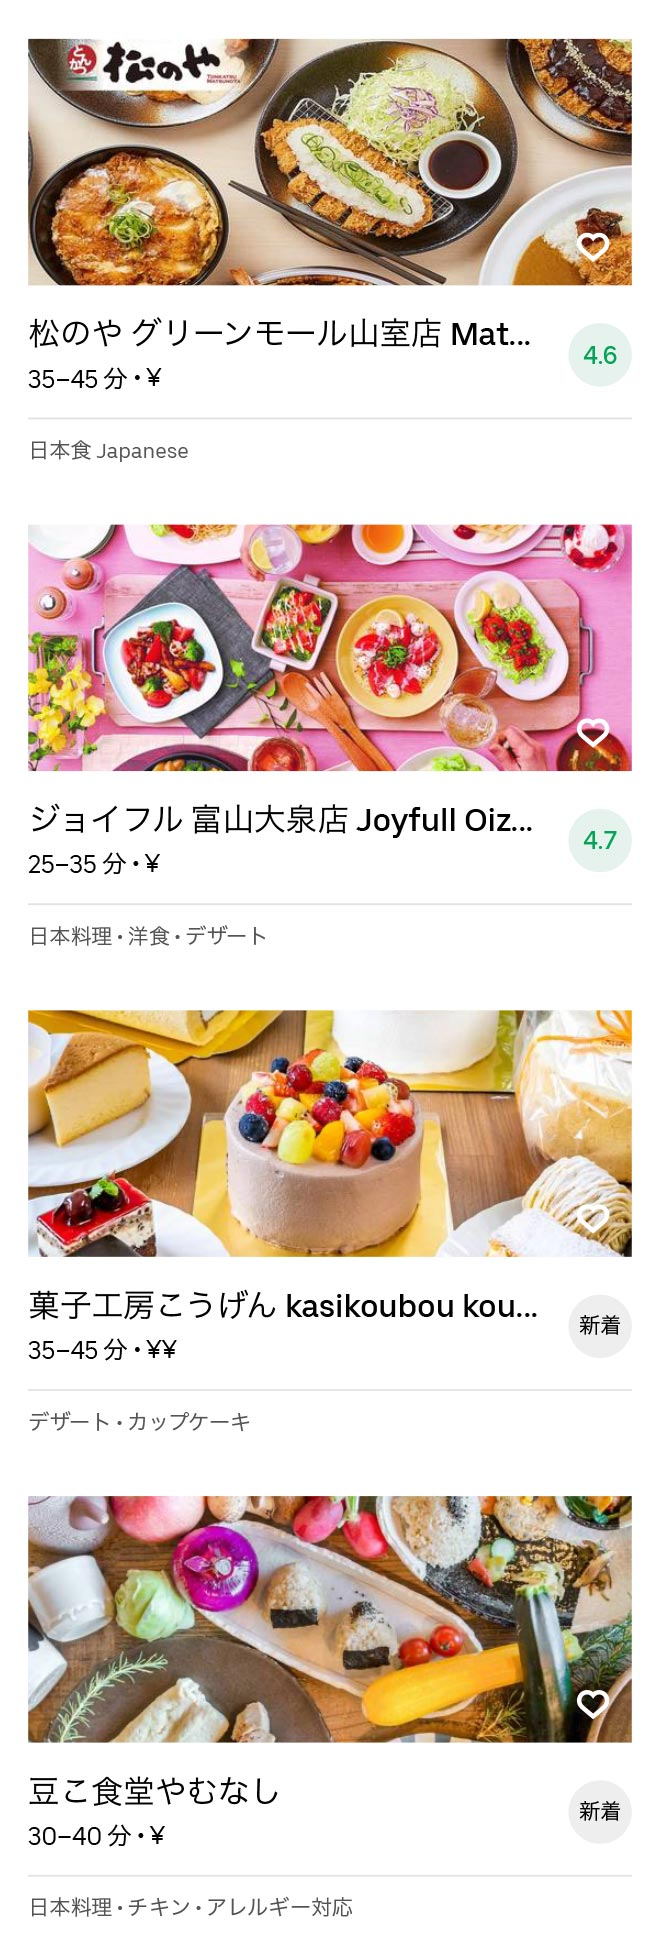 Toyama menu 2009 08